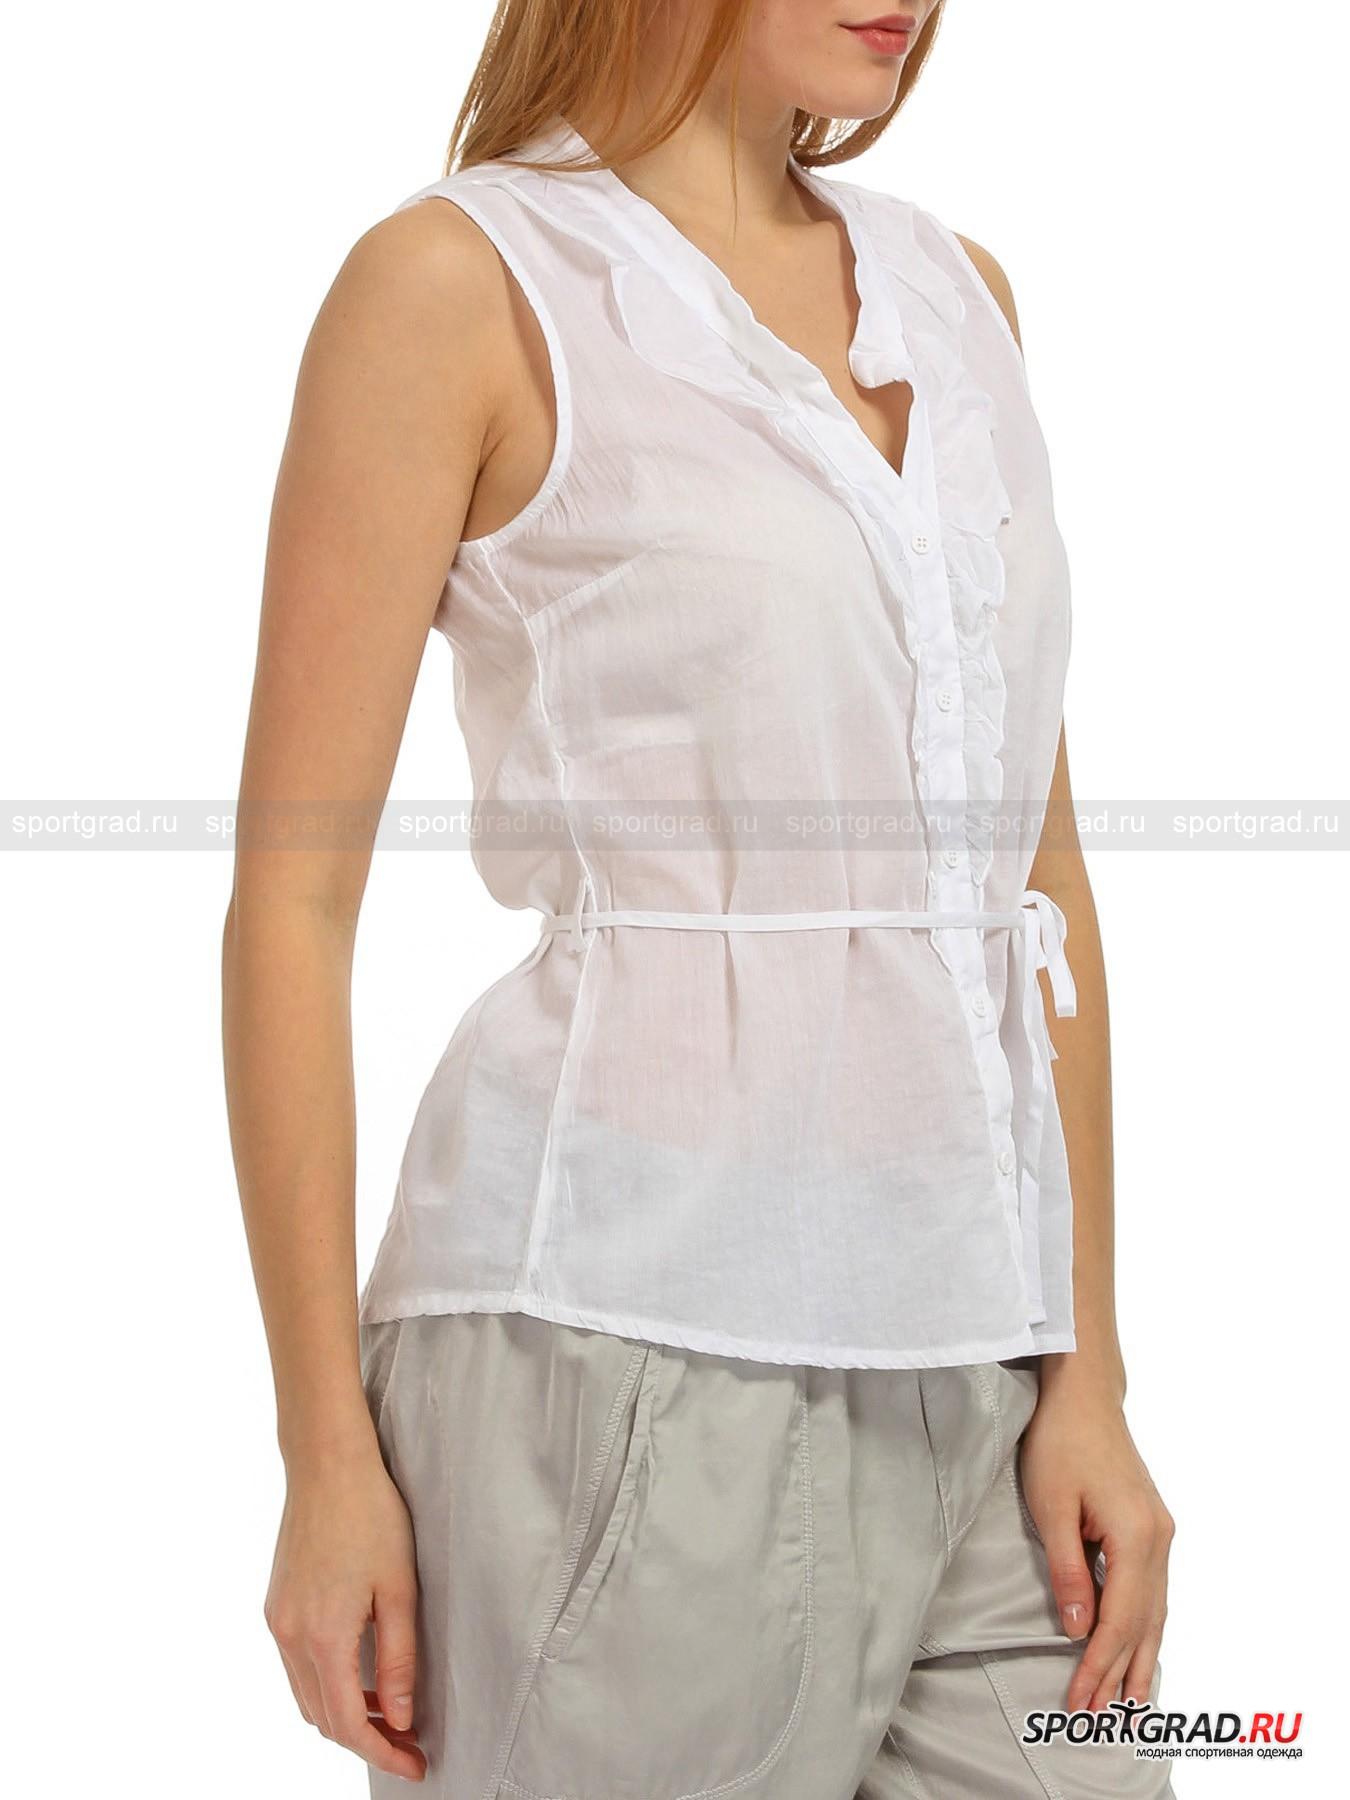 Рубашка женская хлопковая без рукавов Sleeveless  DEHA от Спортград